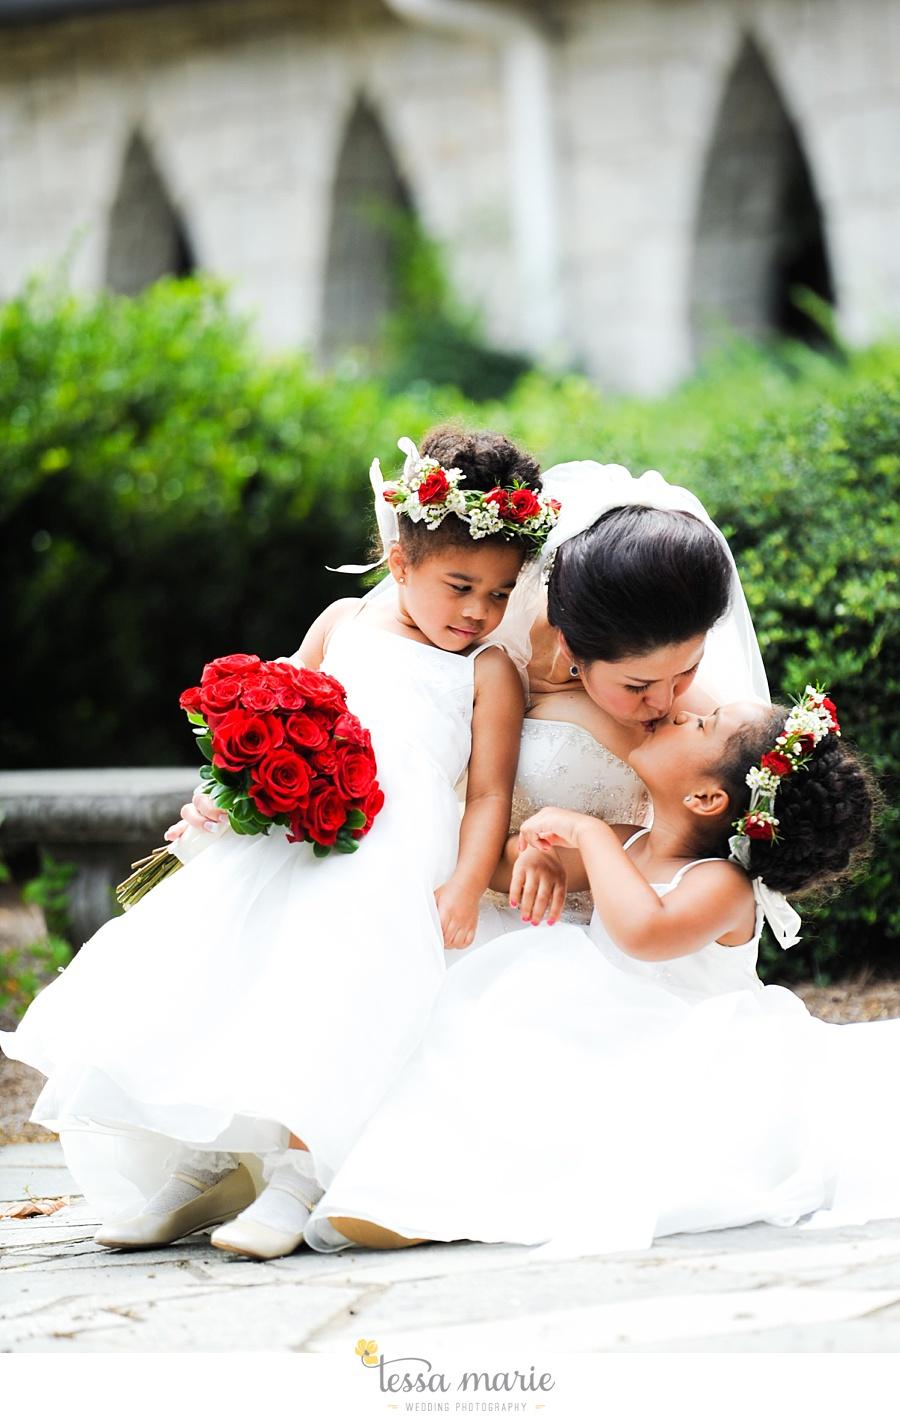 evergreen_resort_wedding_reception_stone_mountain_tessa_marie_weddings_0018